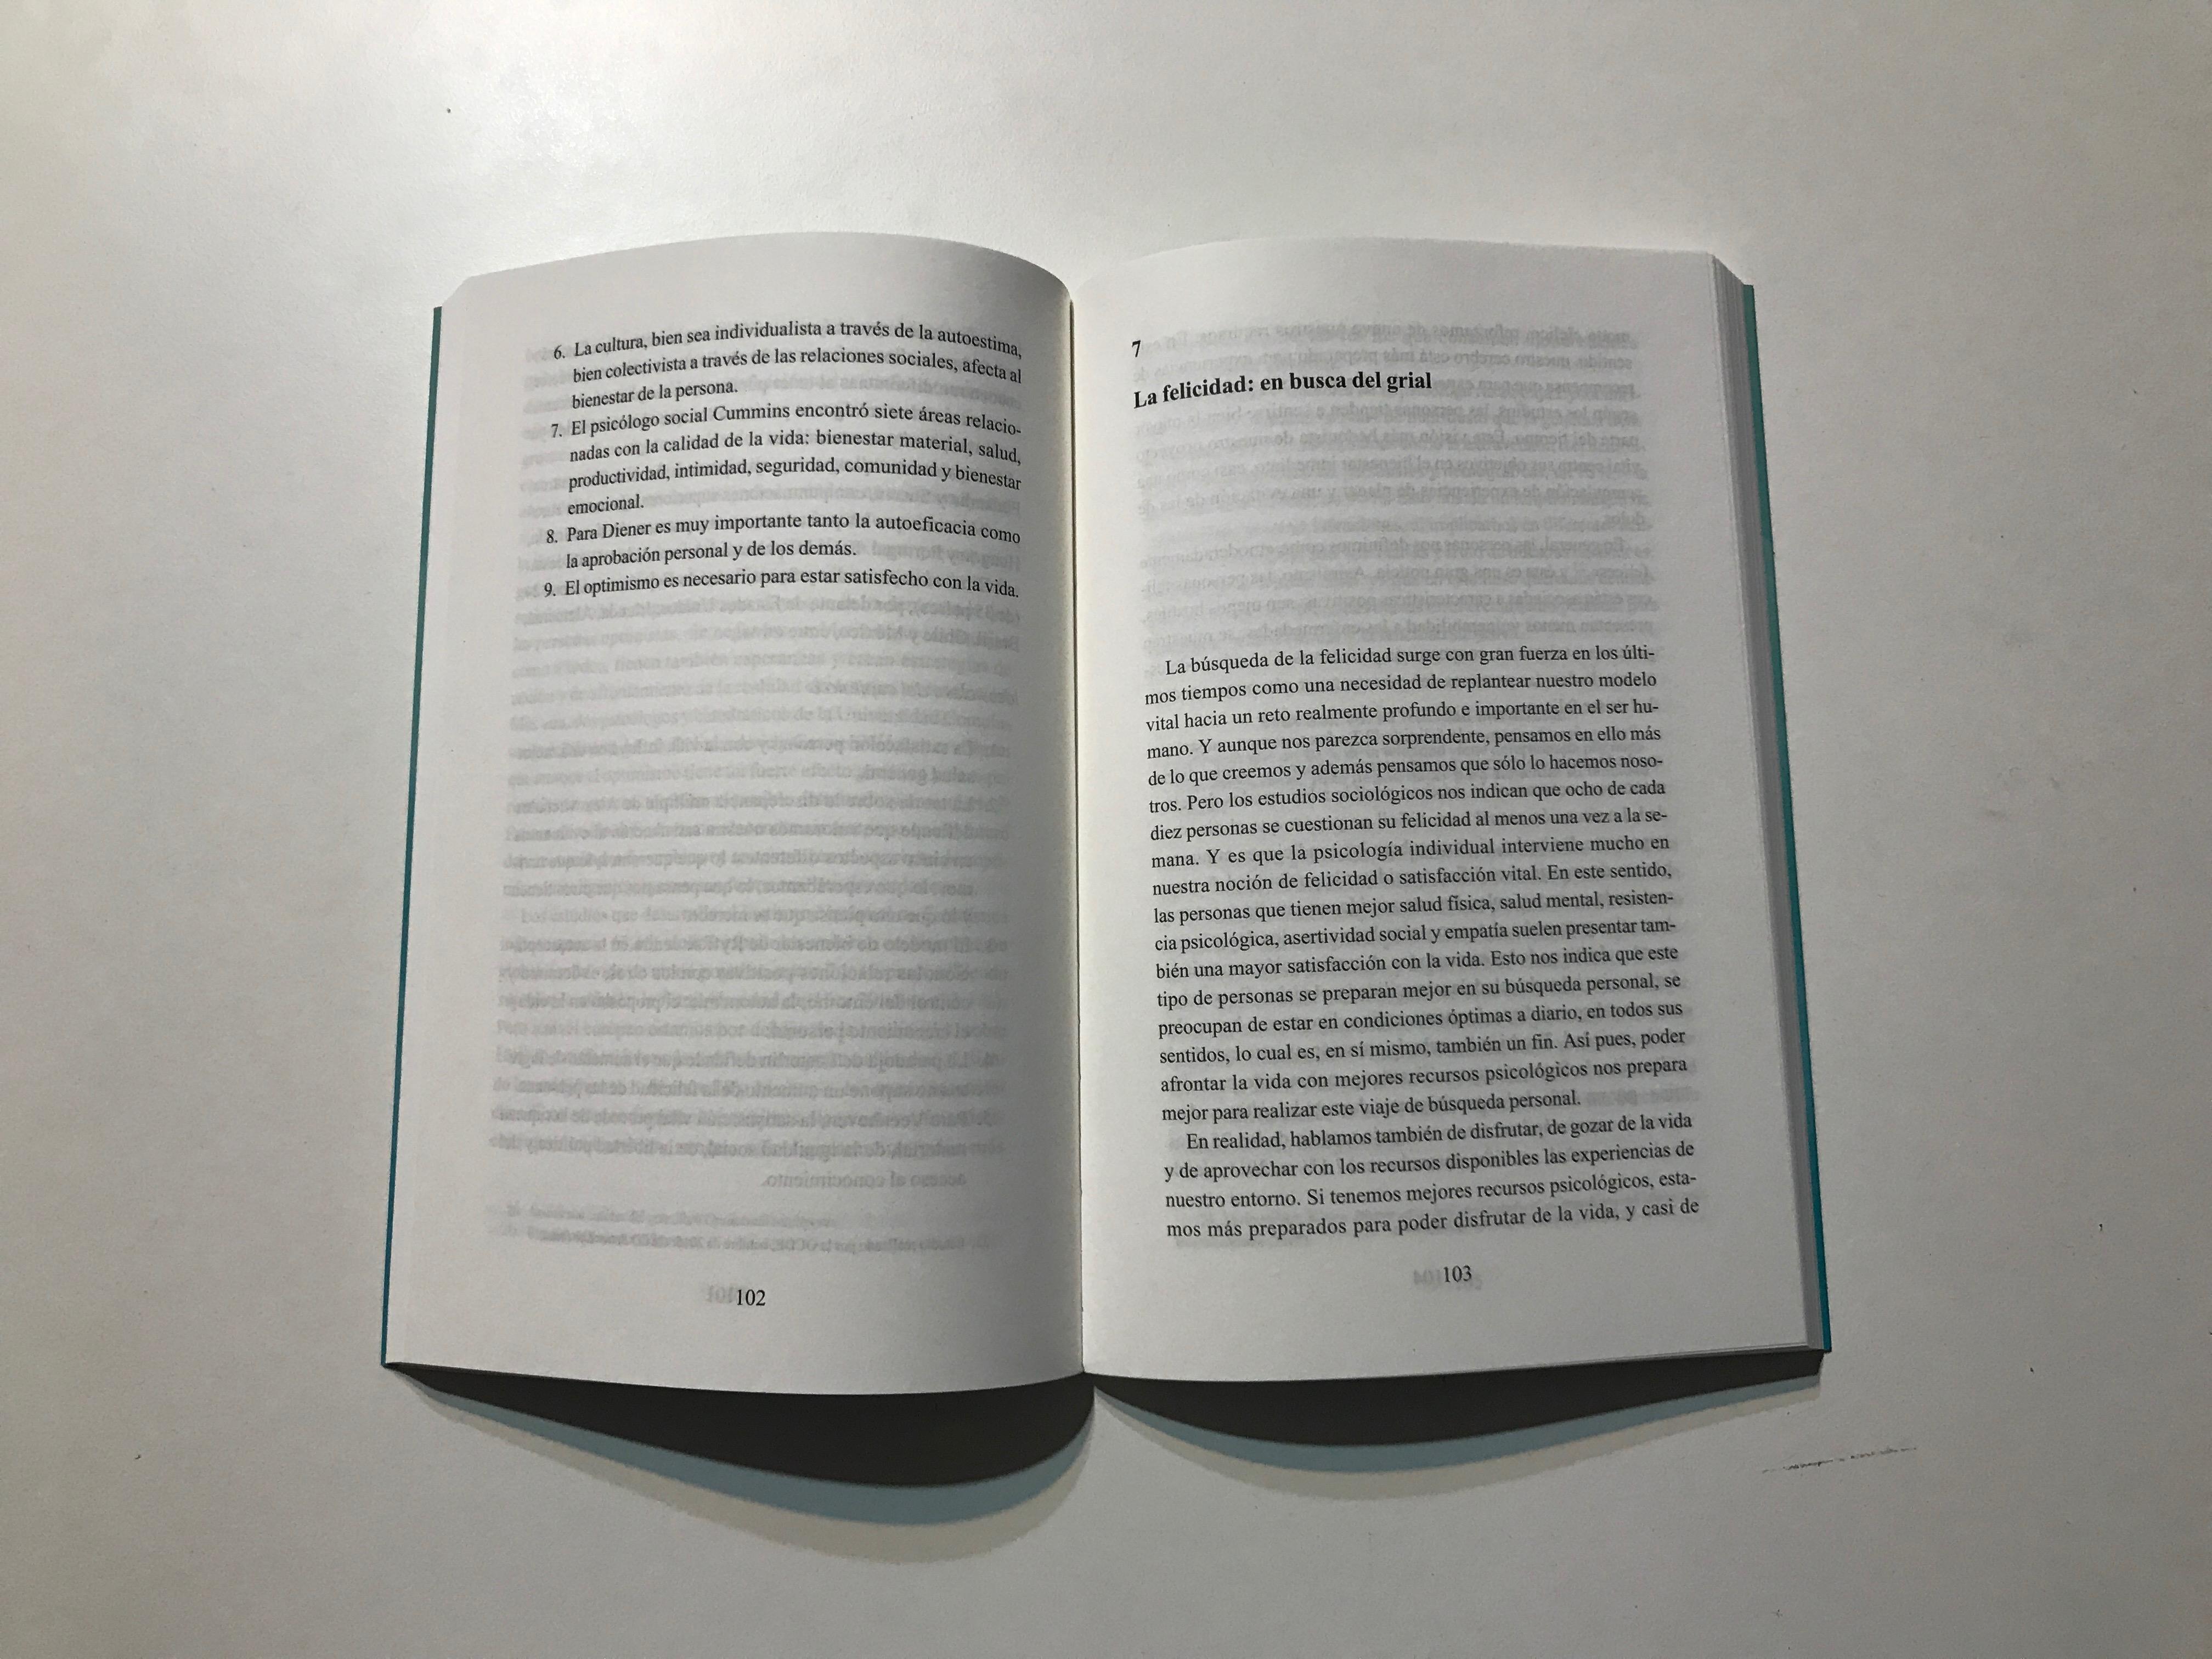 Libro Objetivo Ser Tú Mismo Roberto Luna Ed. Paidós Planeta 2017 Nuevo libro de Desarrollo Personal